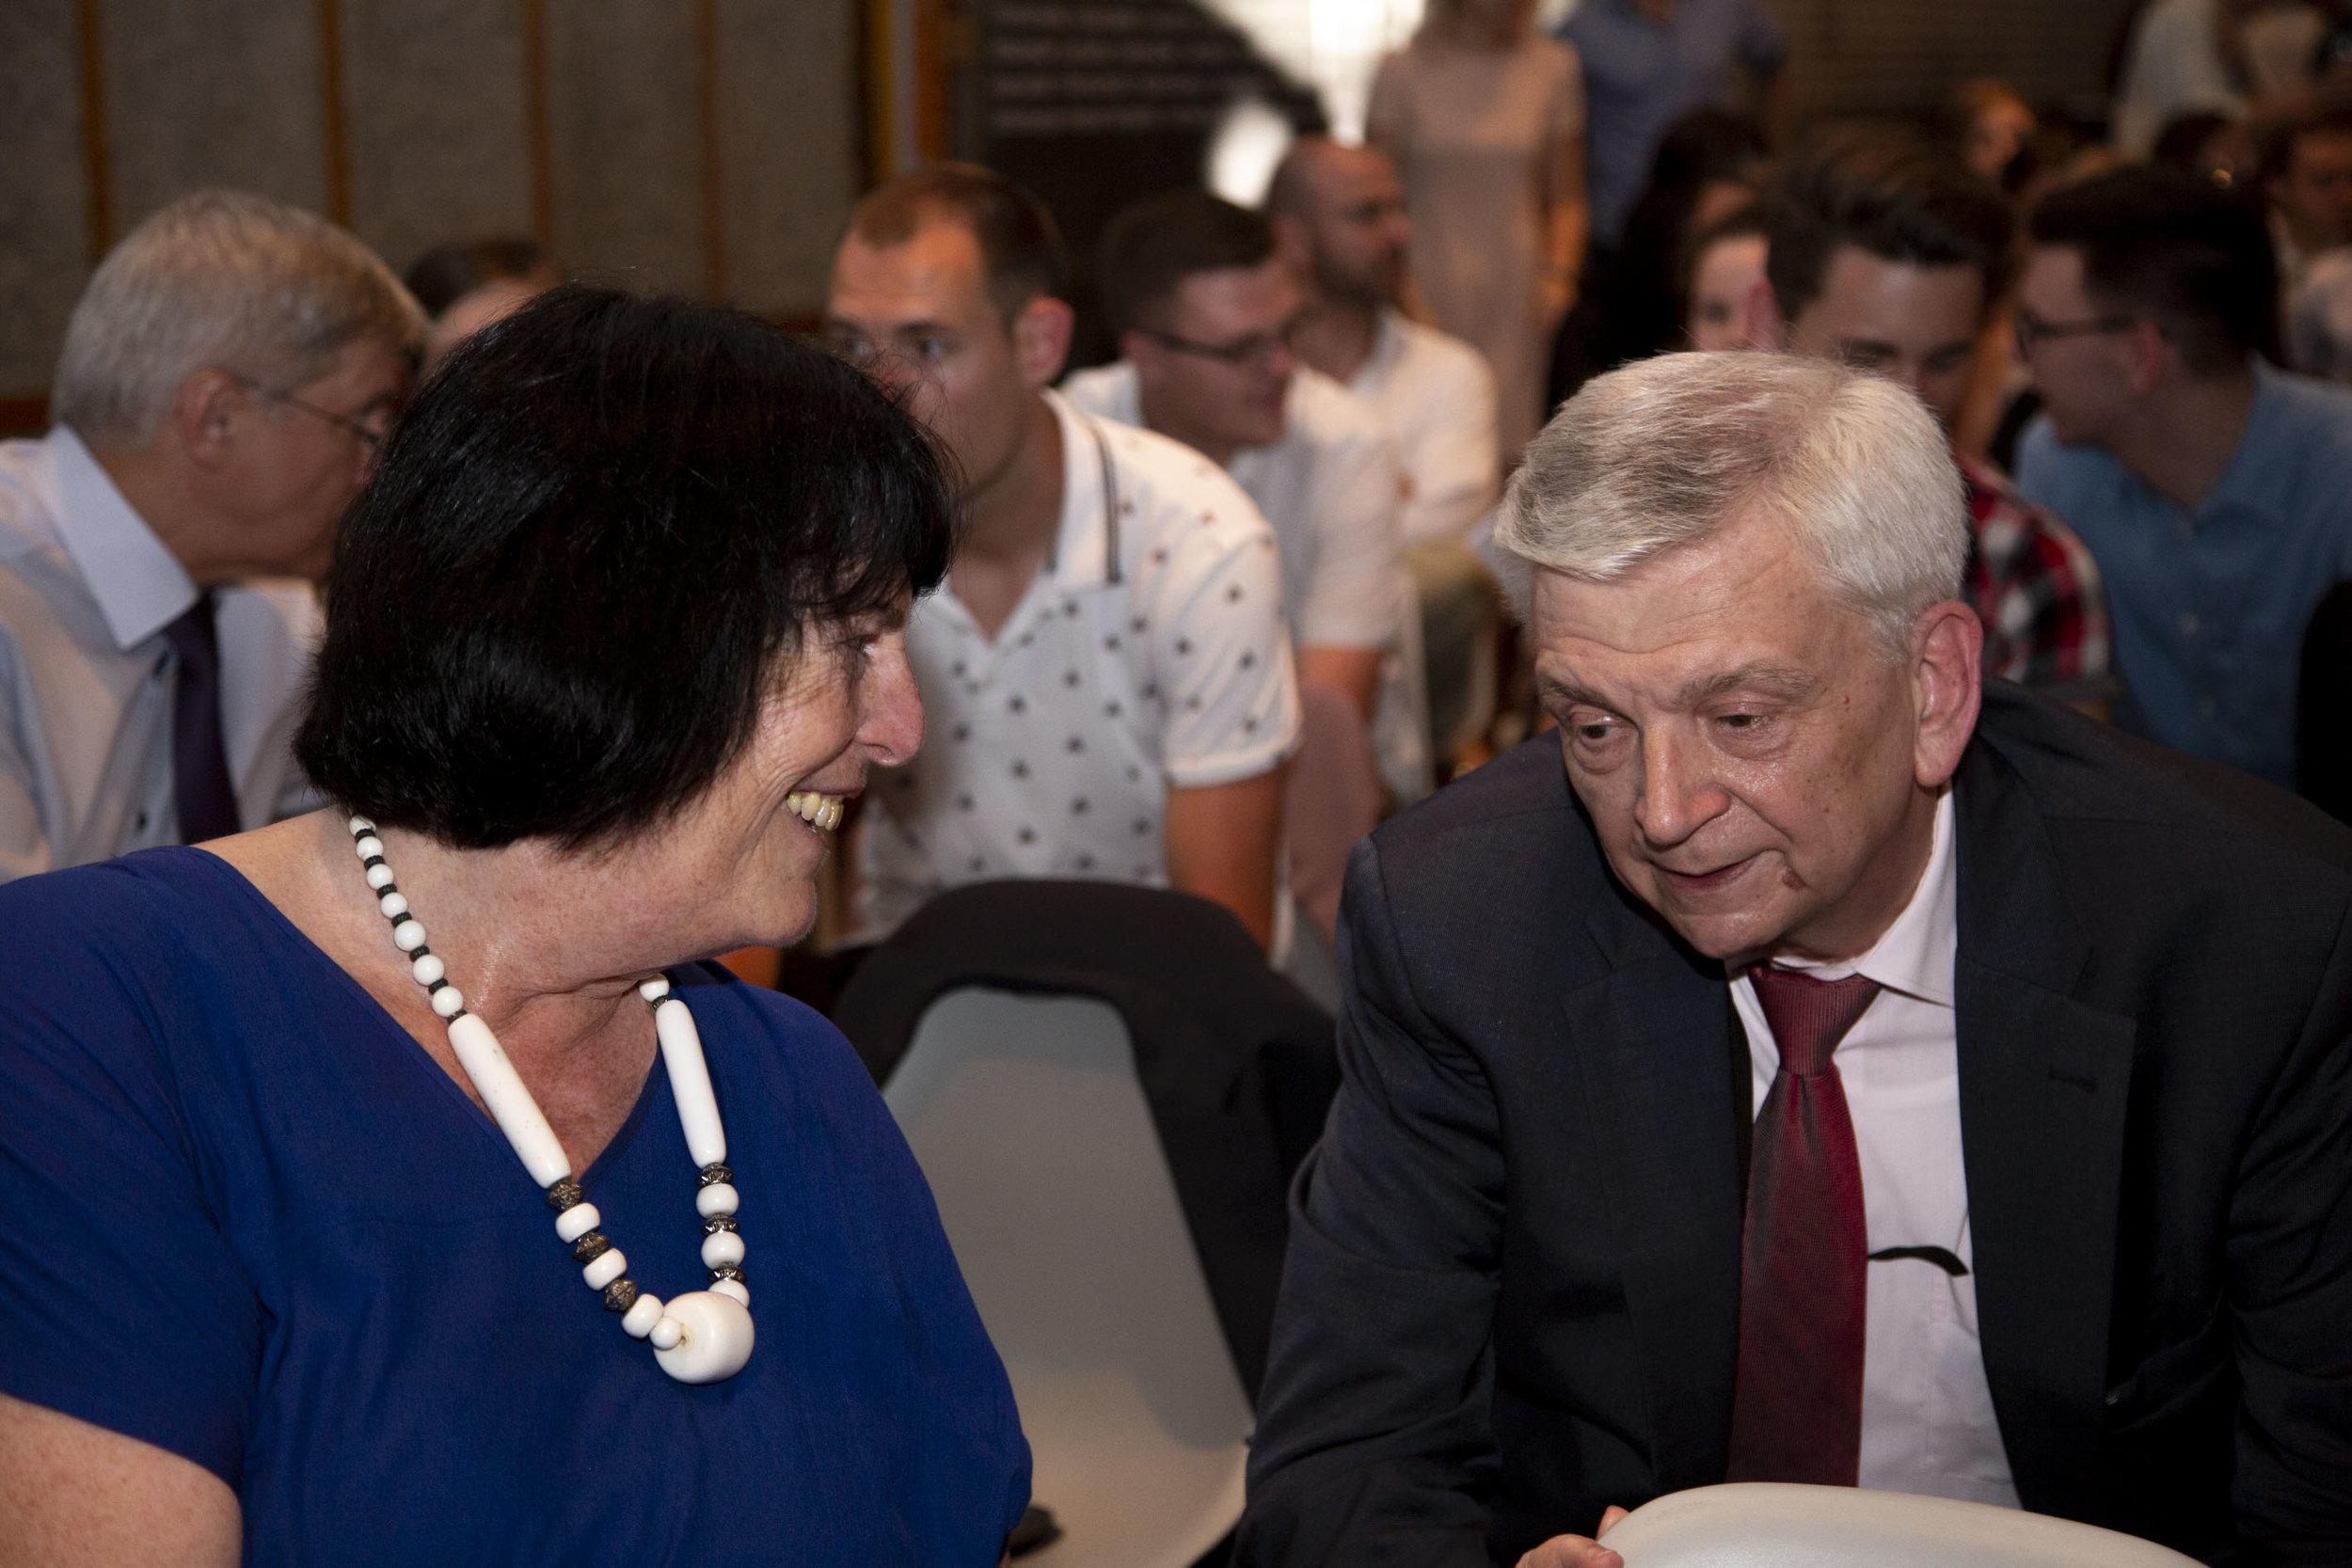 Ambassador Eva Nowotny (left), Ambassador Hans Peter Manz